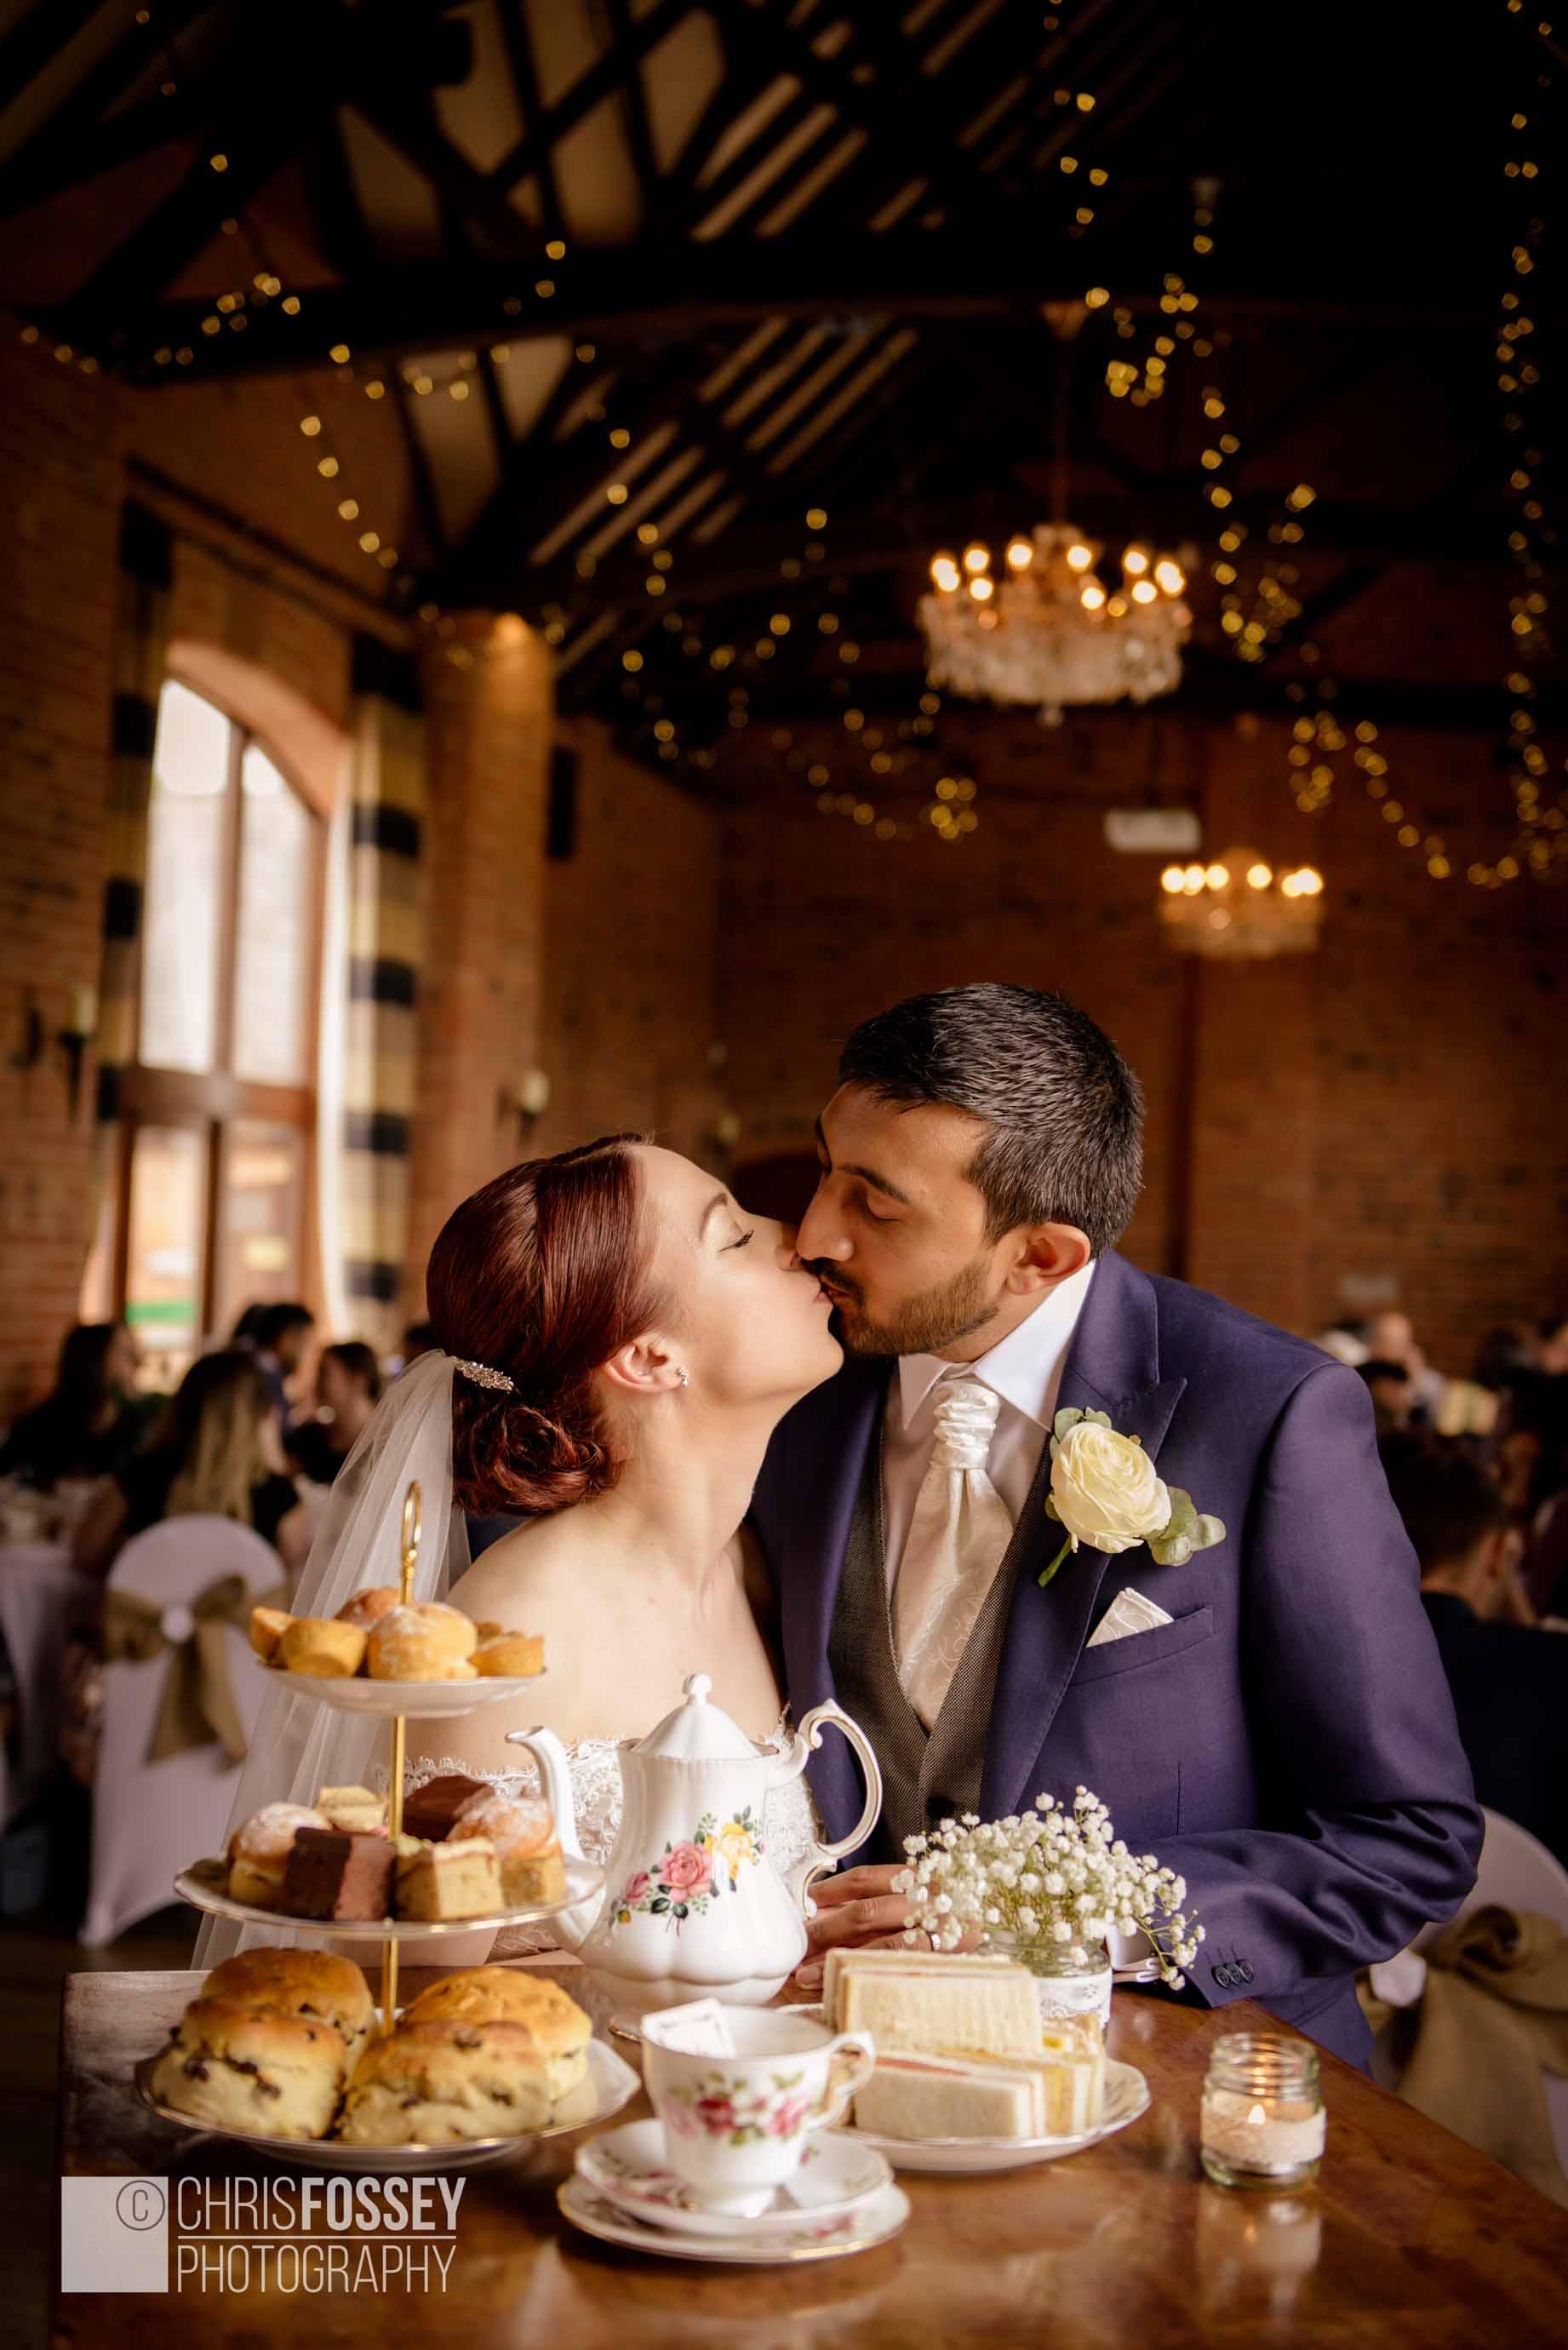 Vijay-Becca-Wedding-Photography-Coventry-Register-Office-Ingon-Manor-Stratford-upon-Avon-Warwickshire